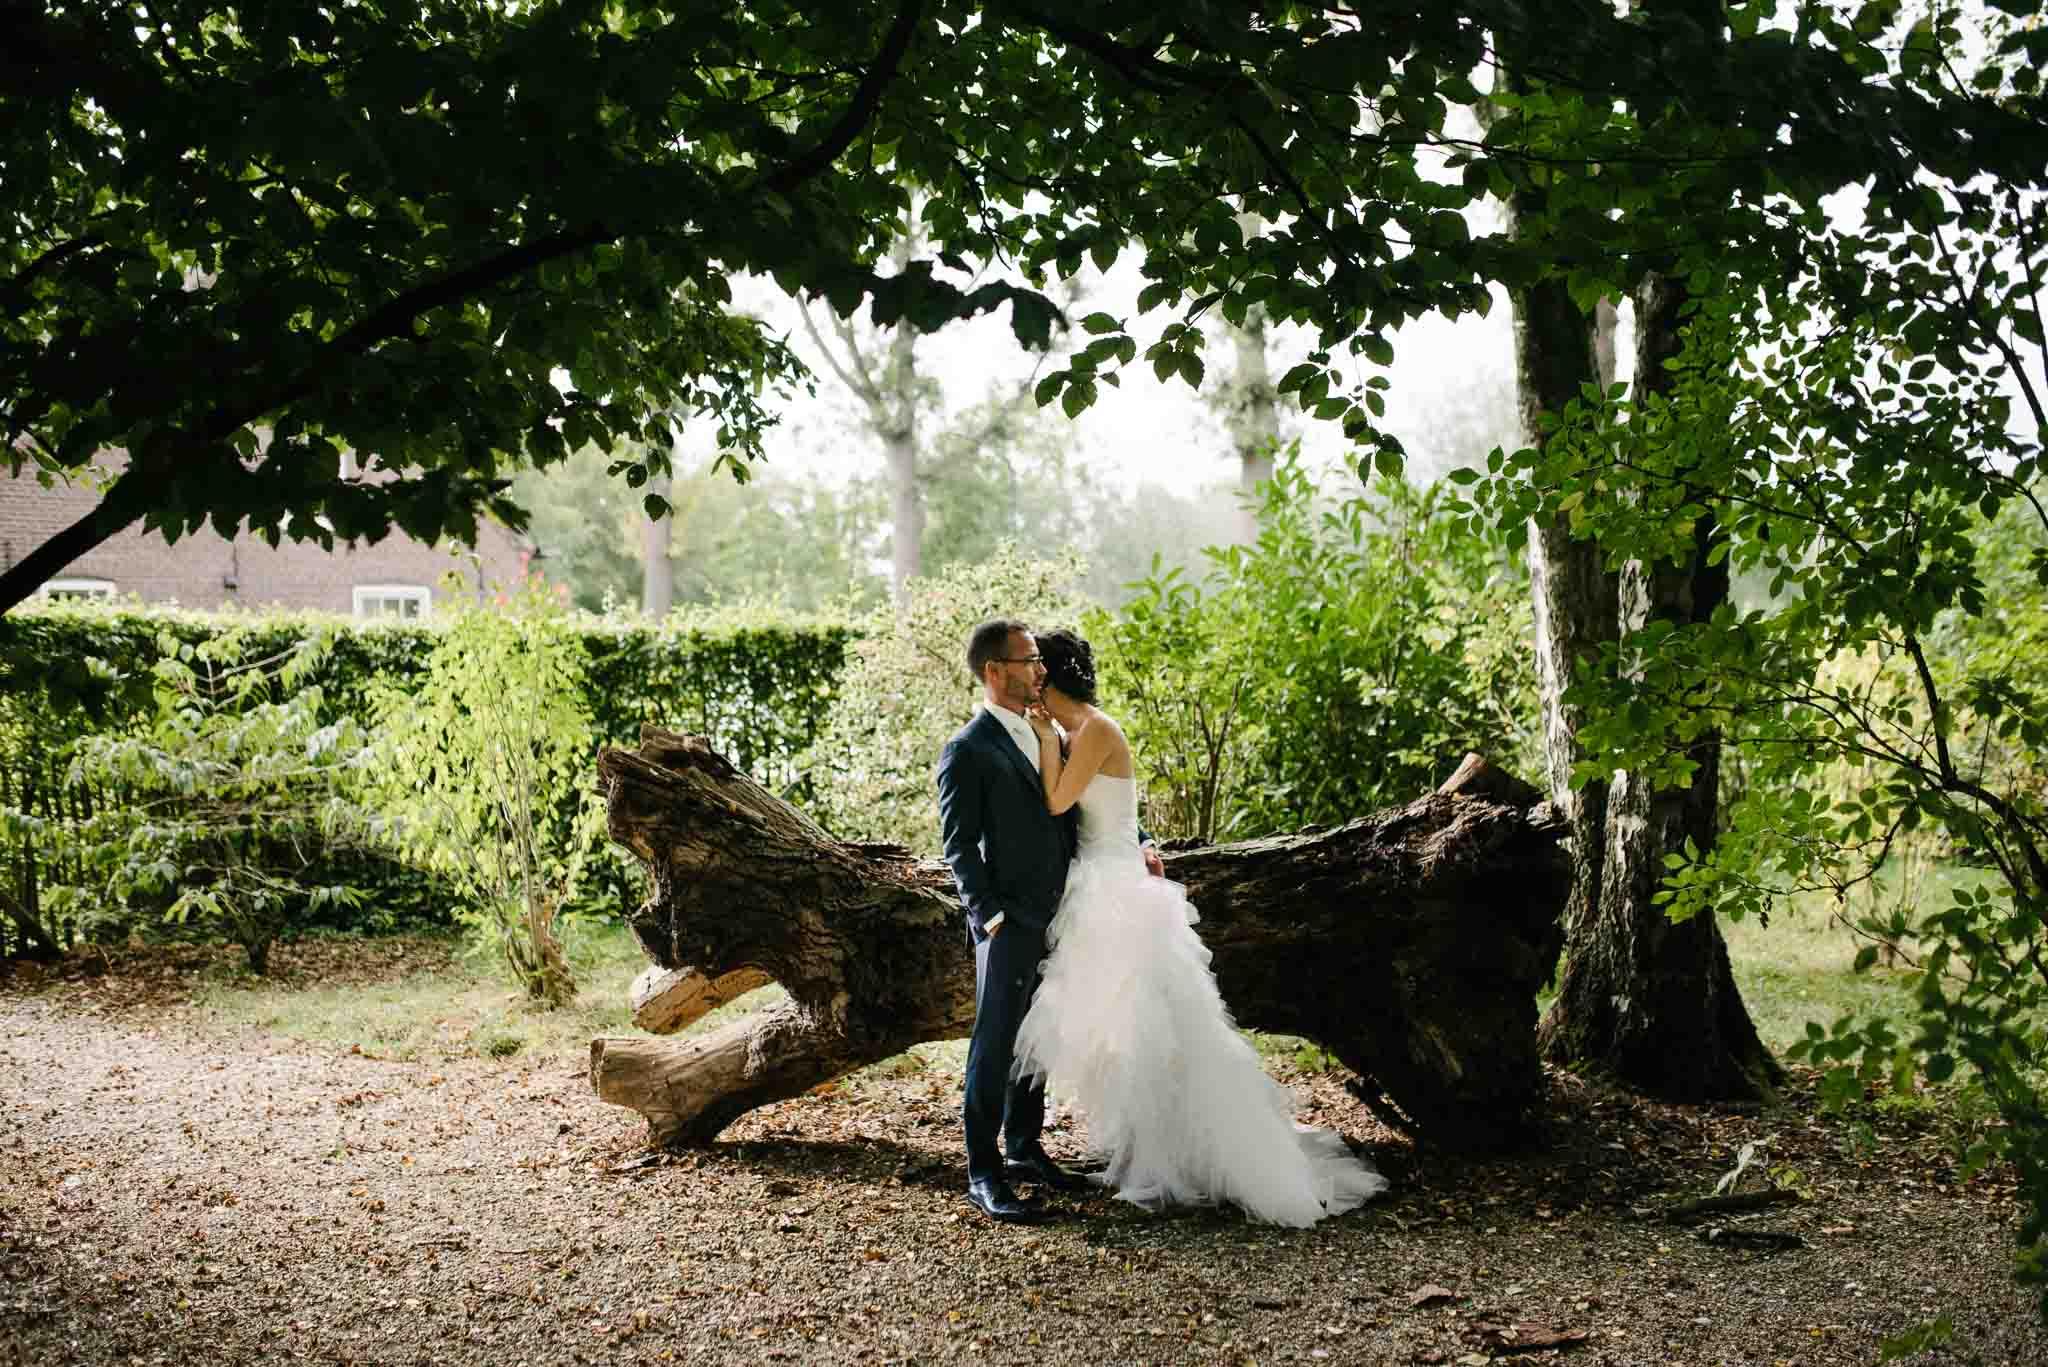 bruidsfotograaf Eindhoven originele bruidsfotos